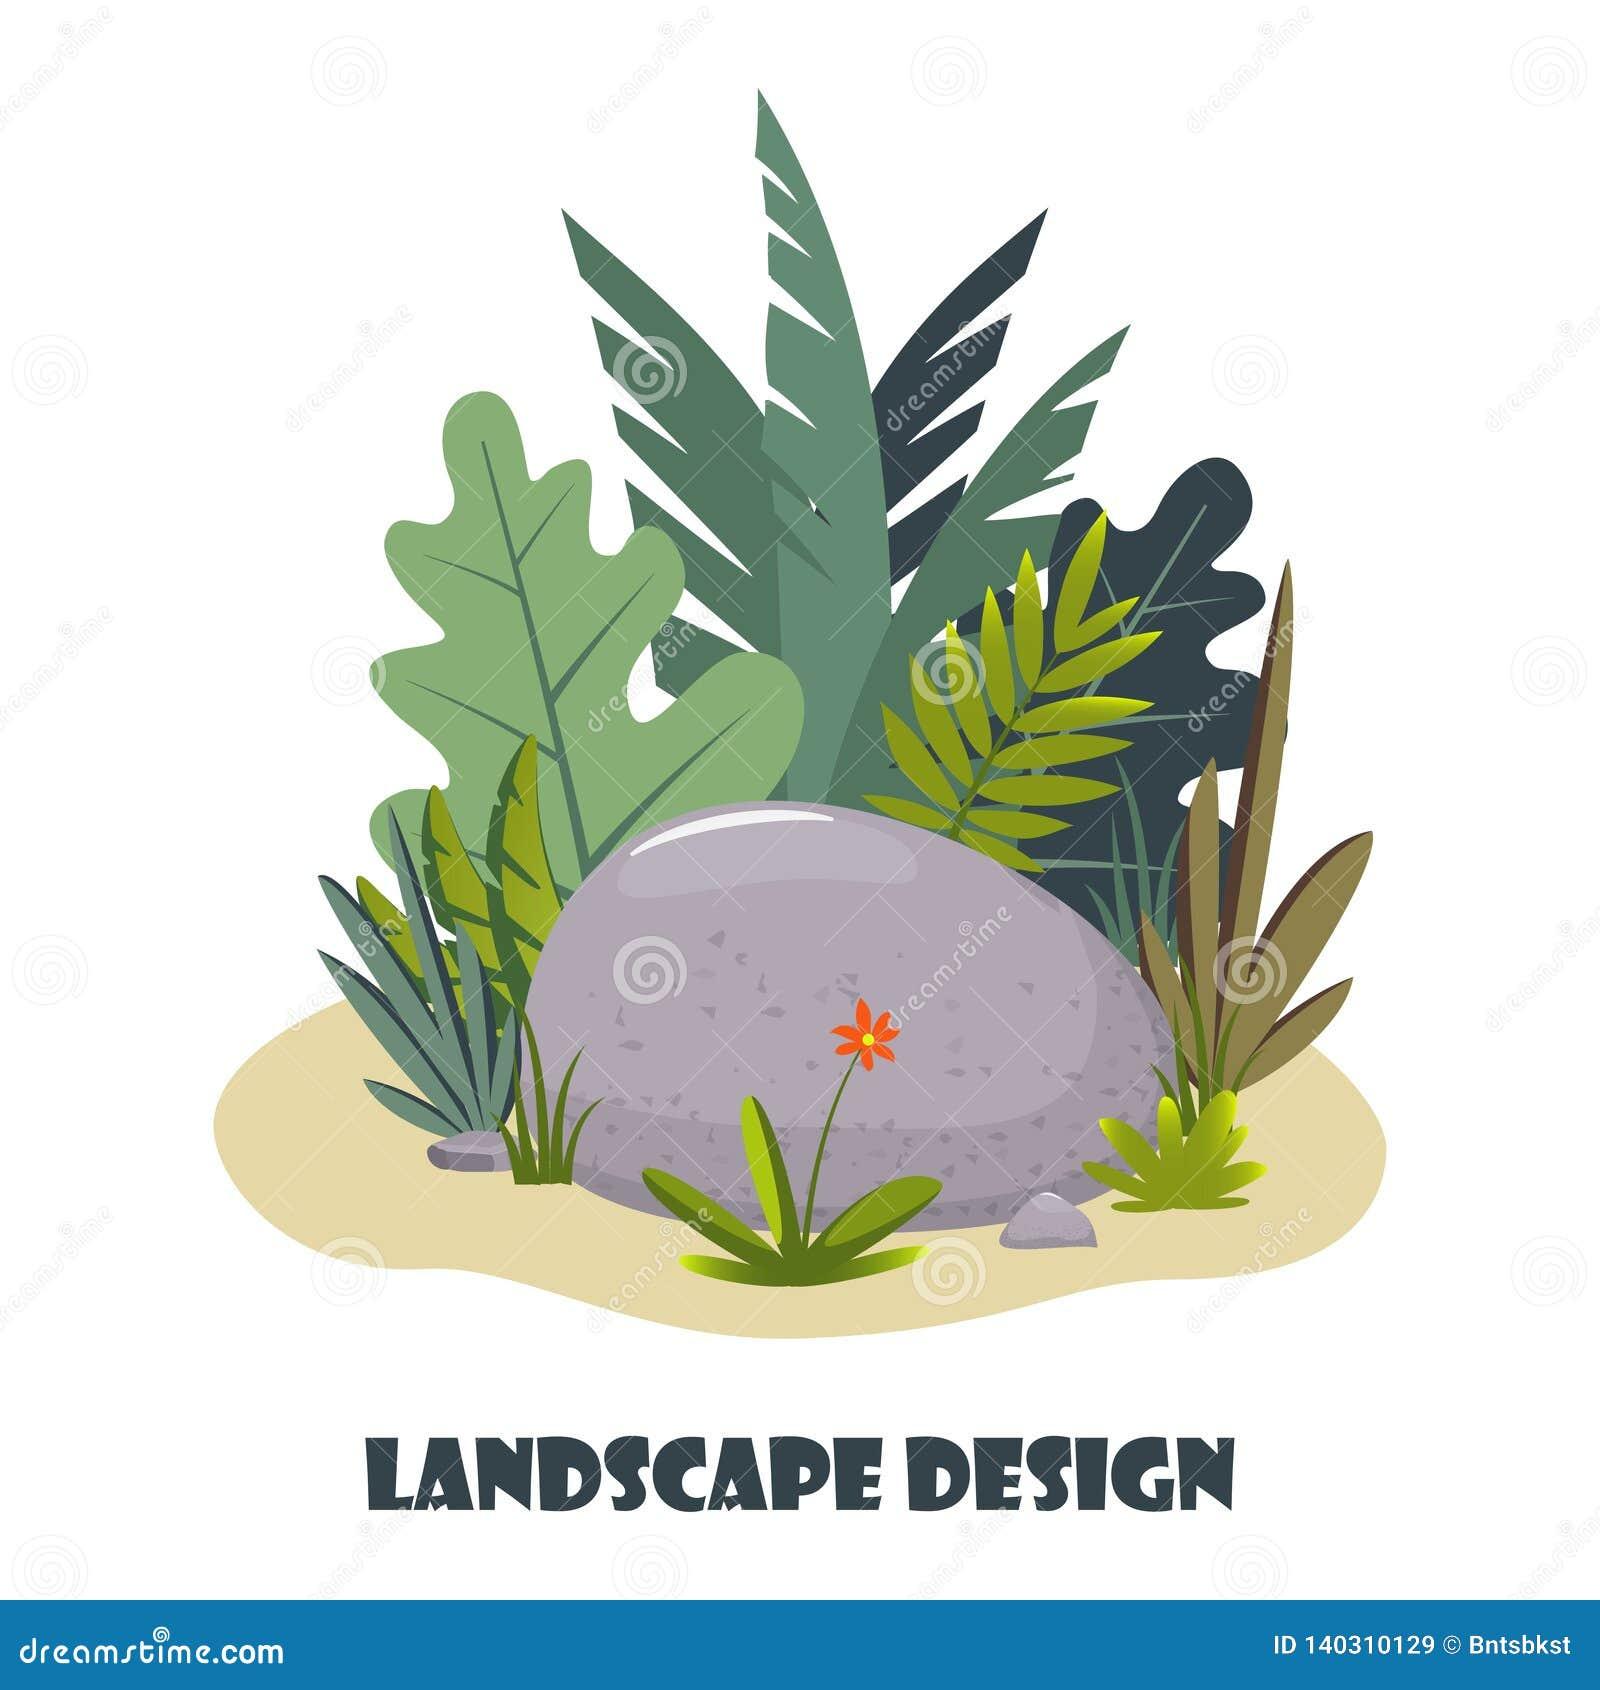 Landscape Design Composition With Plant And Stones Cute Floral Composition For Greeting Card Banner Flyer App Website On Stock Illustration Illustration Of Flora Design 140310129